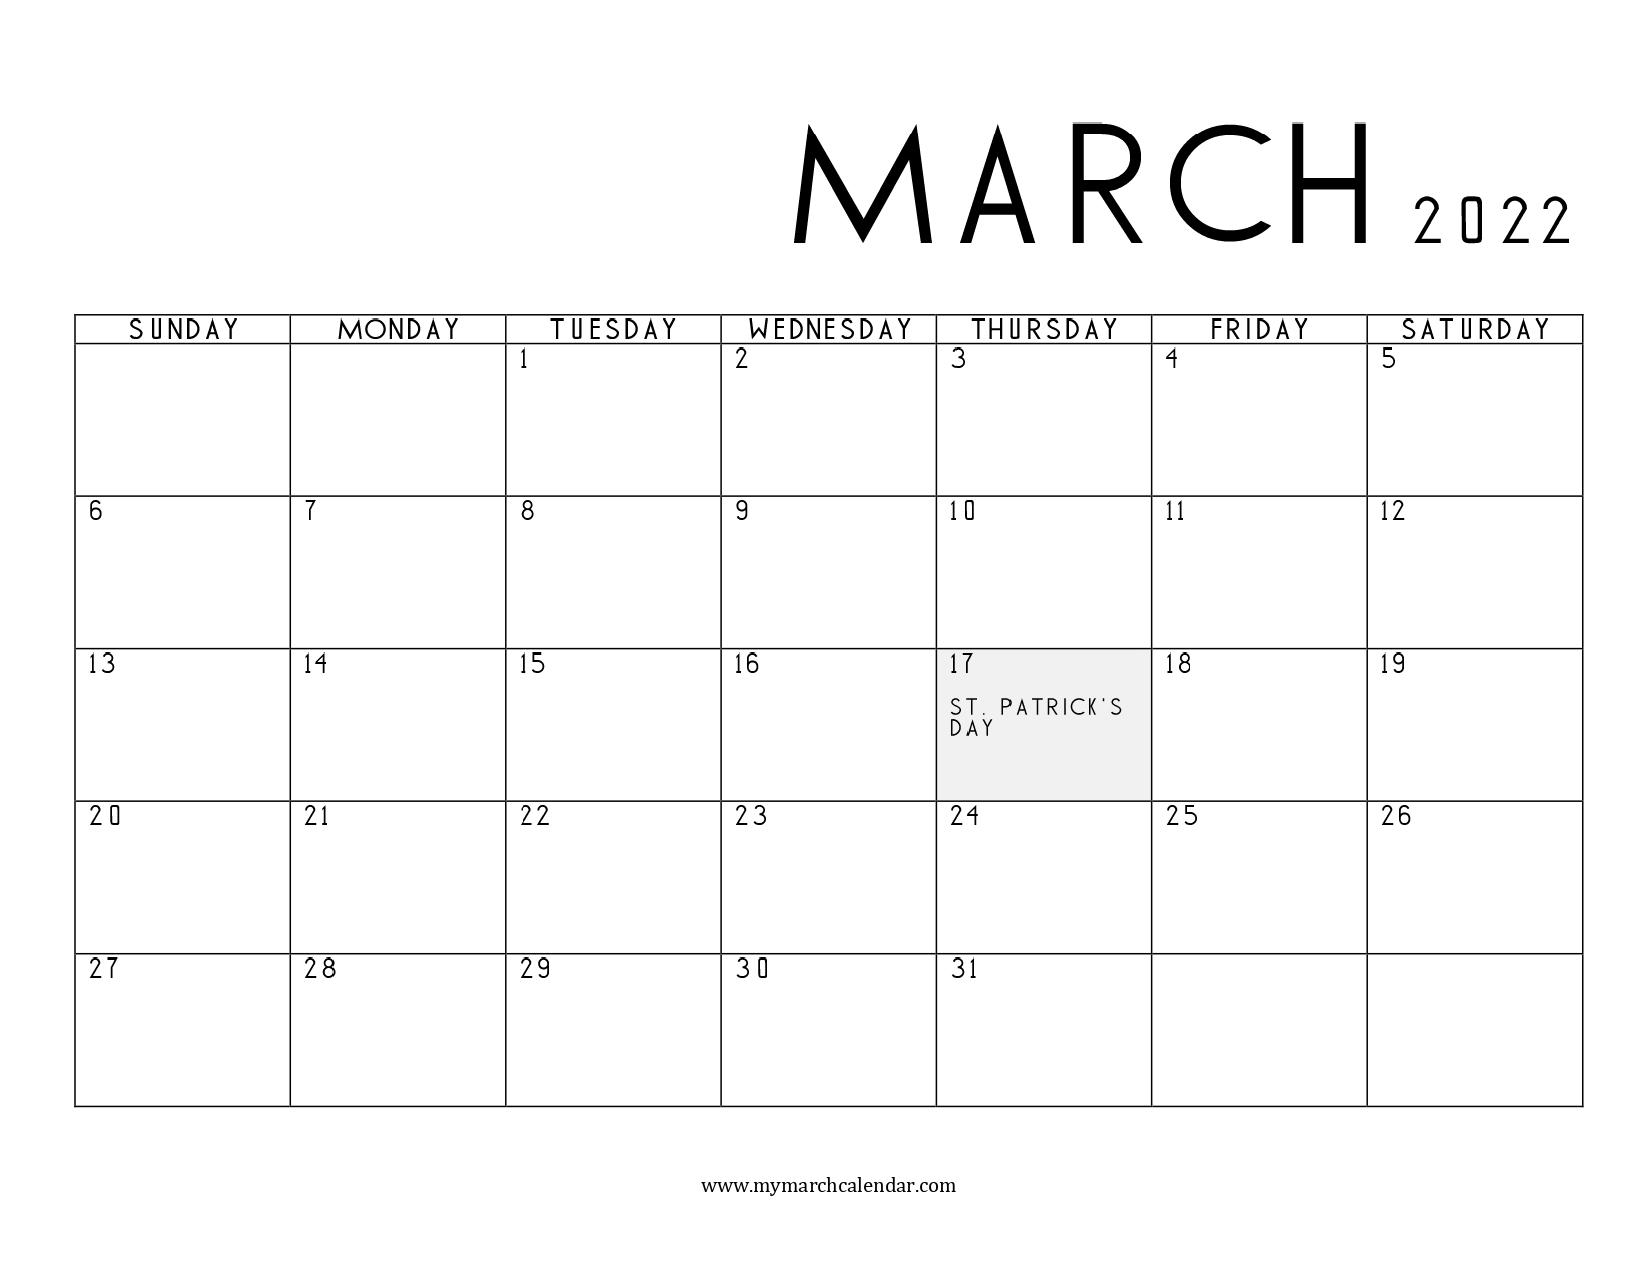 30+ March 2022 Calendar, March 2022 Blank Calendar with March April 2022 Calendar Print